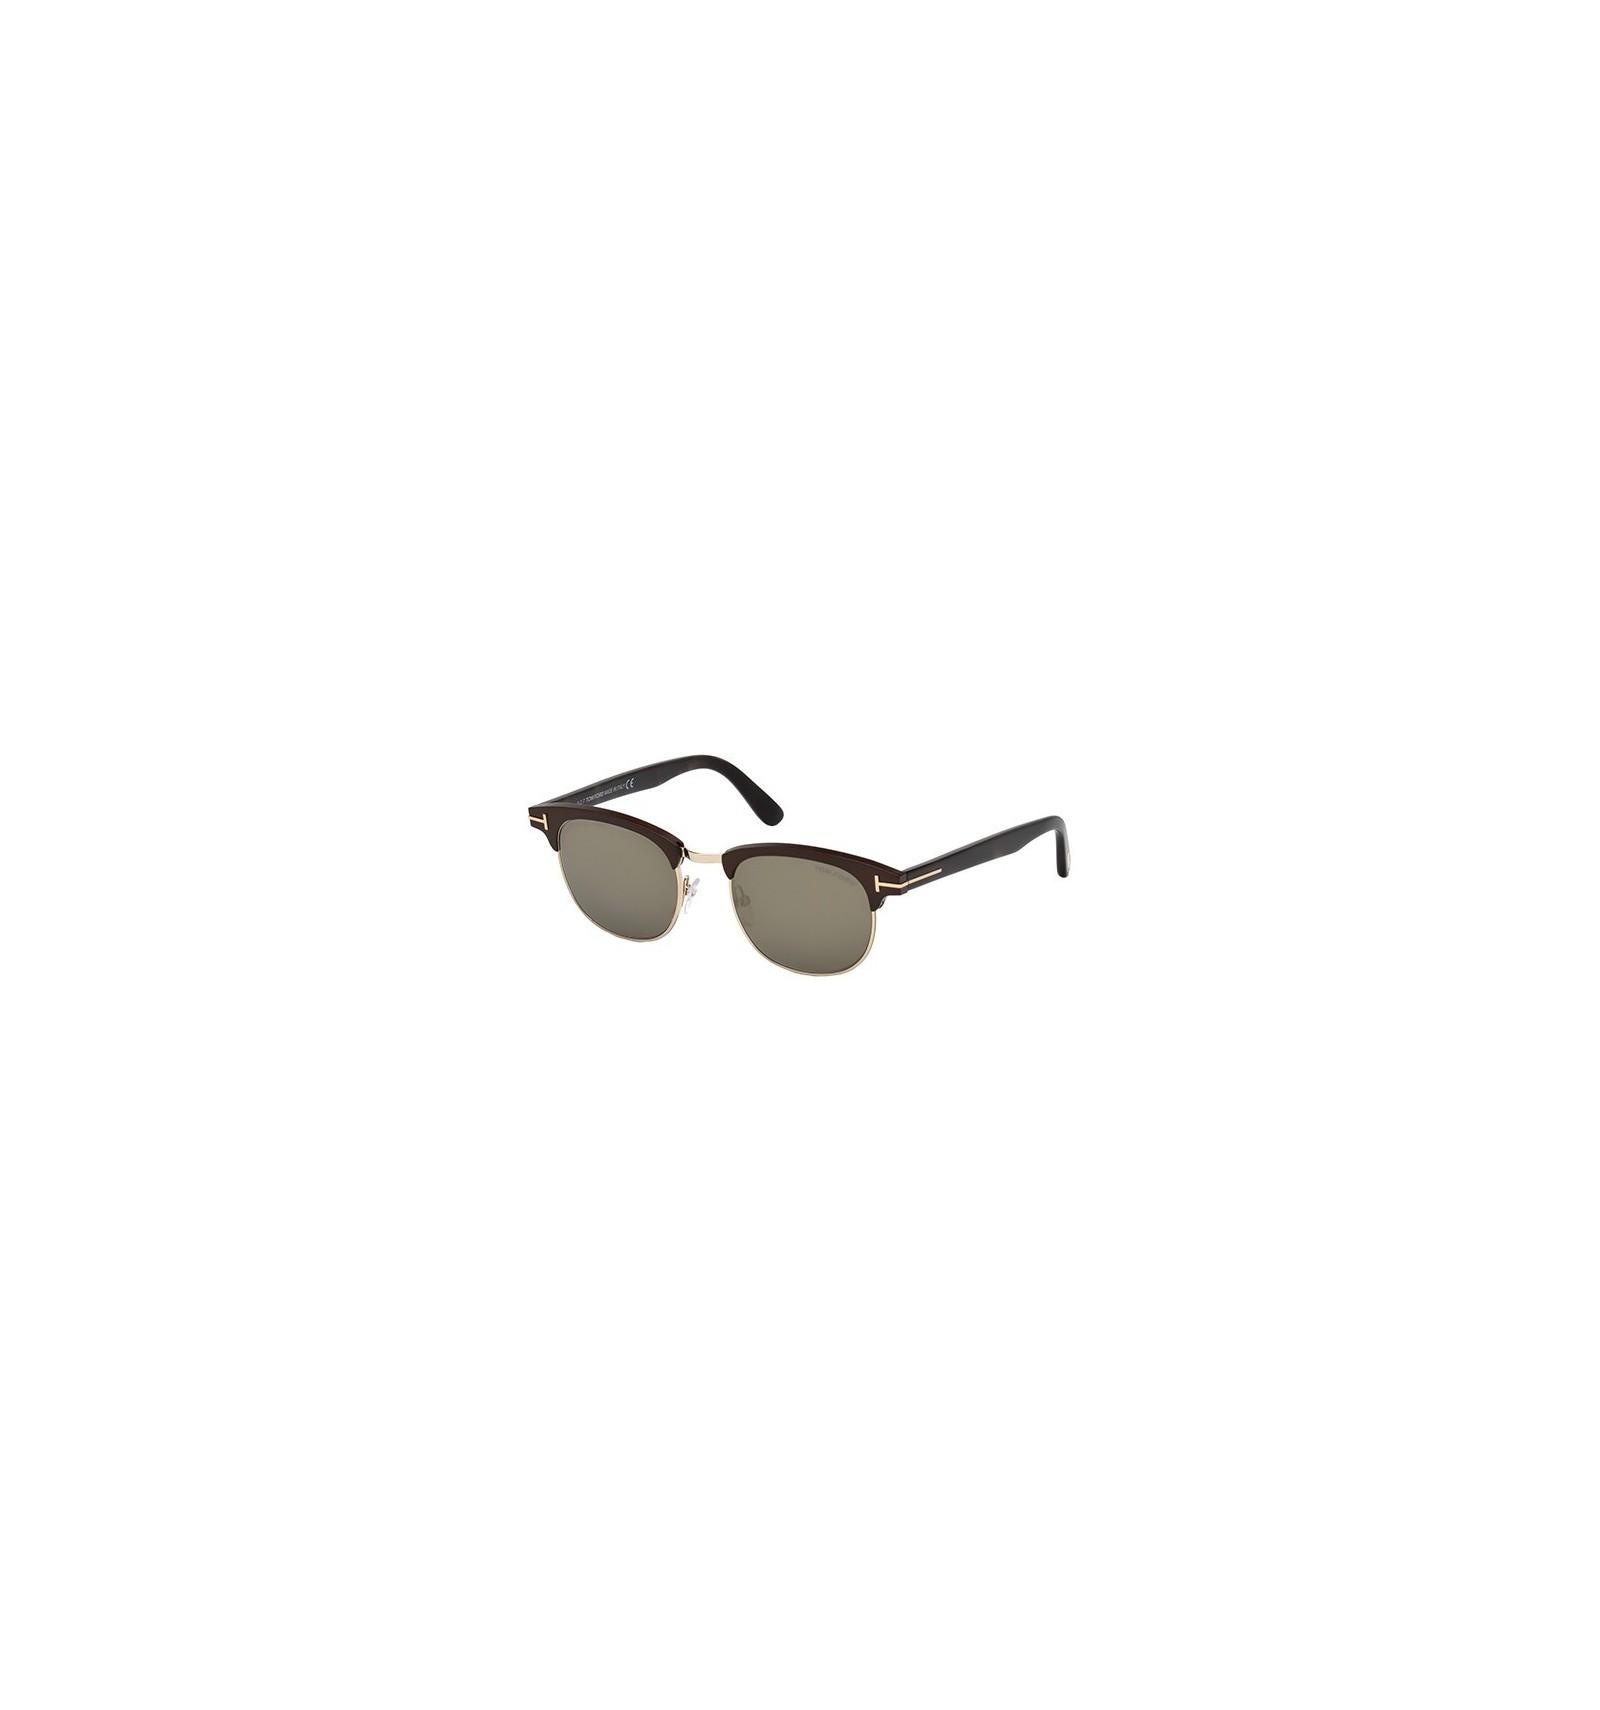 Gafas De Ft0623 SmokeCompra Brown Tom Online Sol Ford Dark Laurent 0nwk8PO